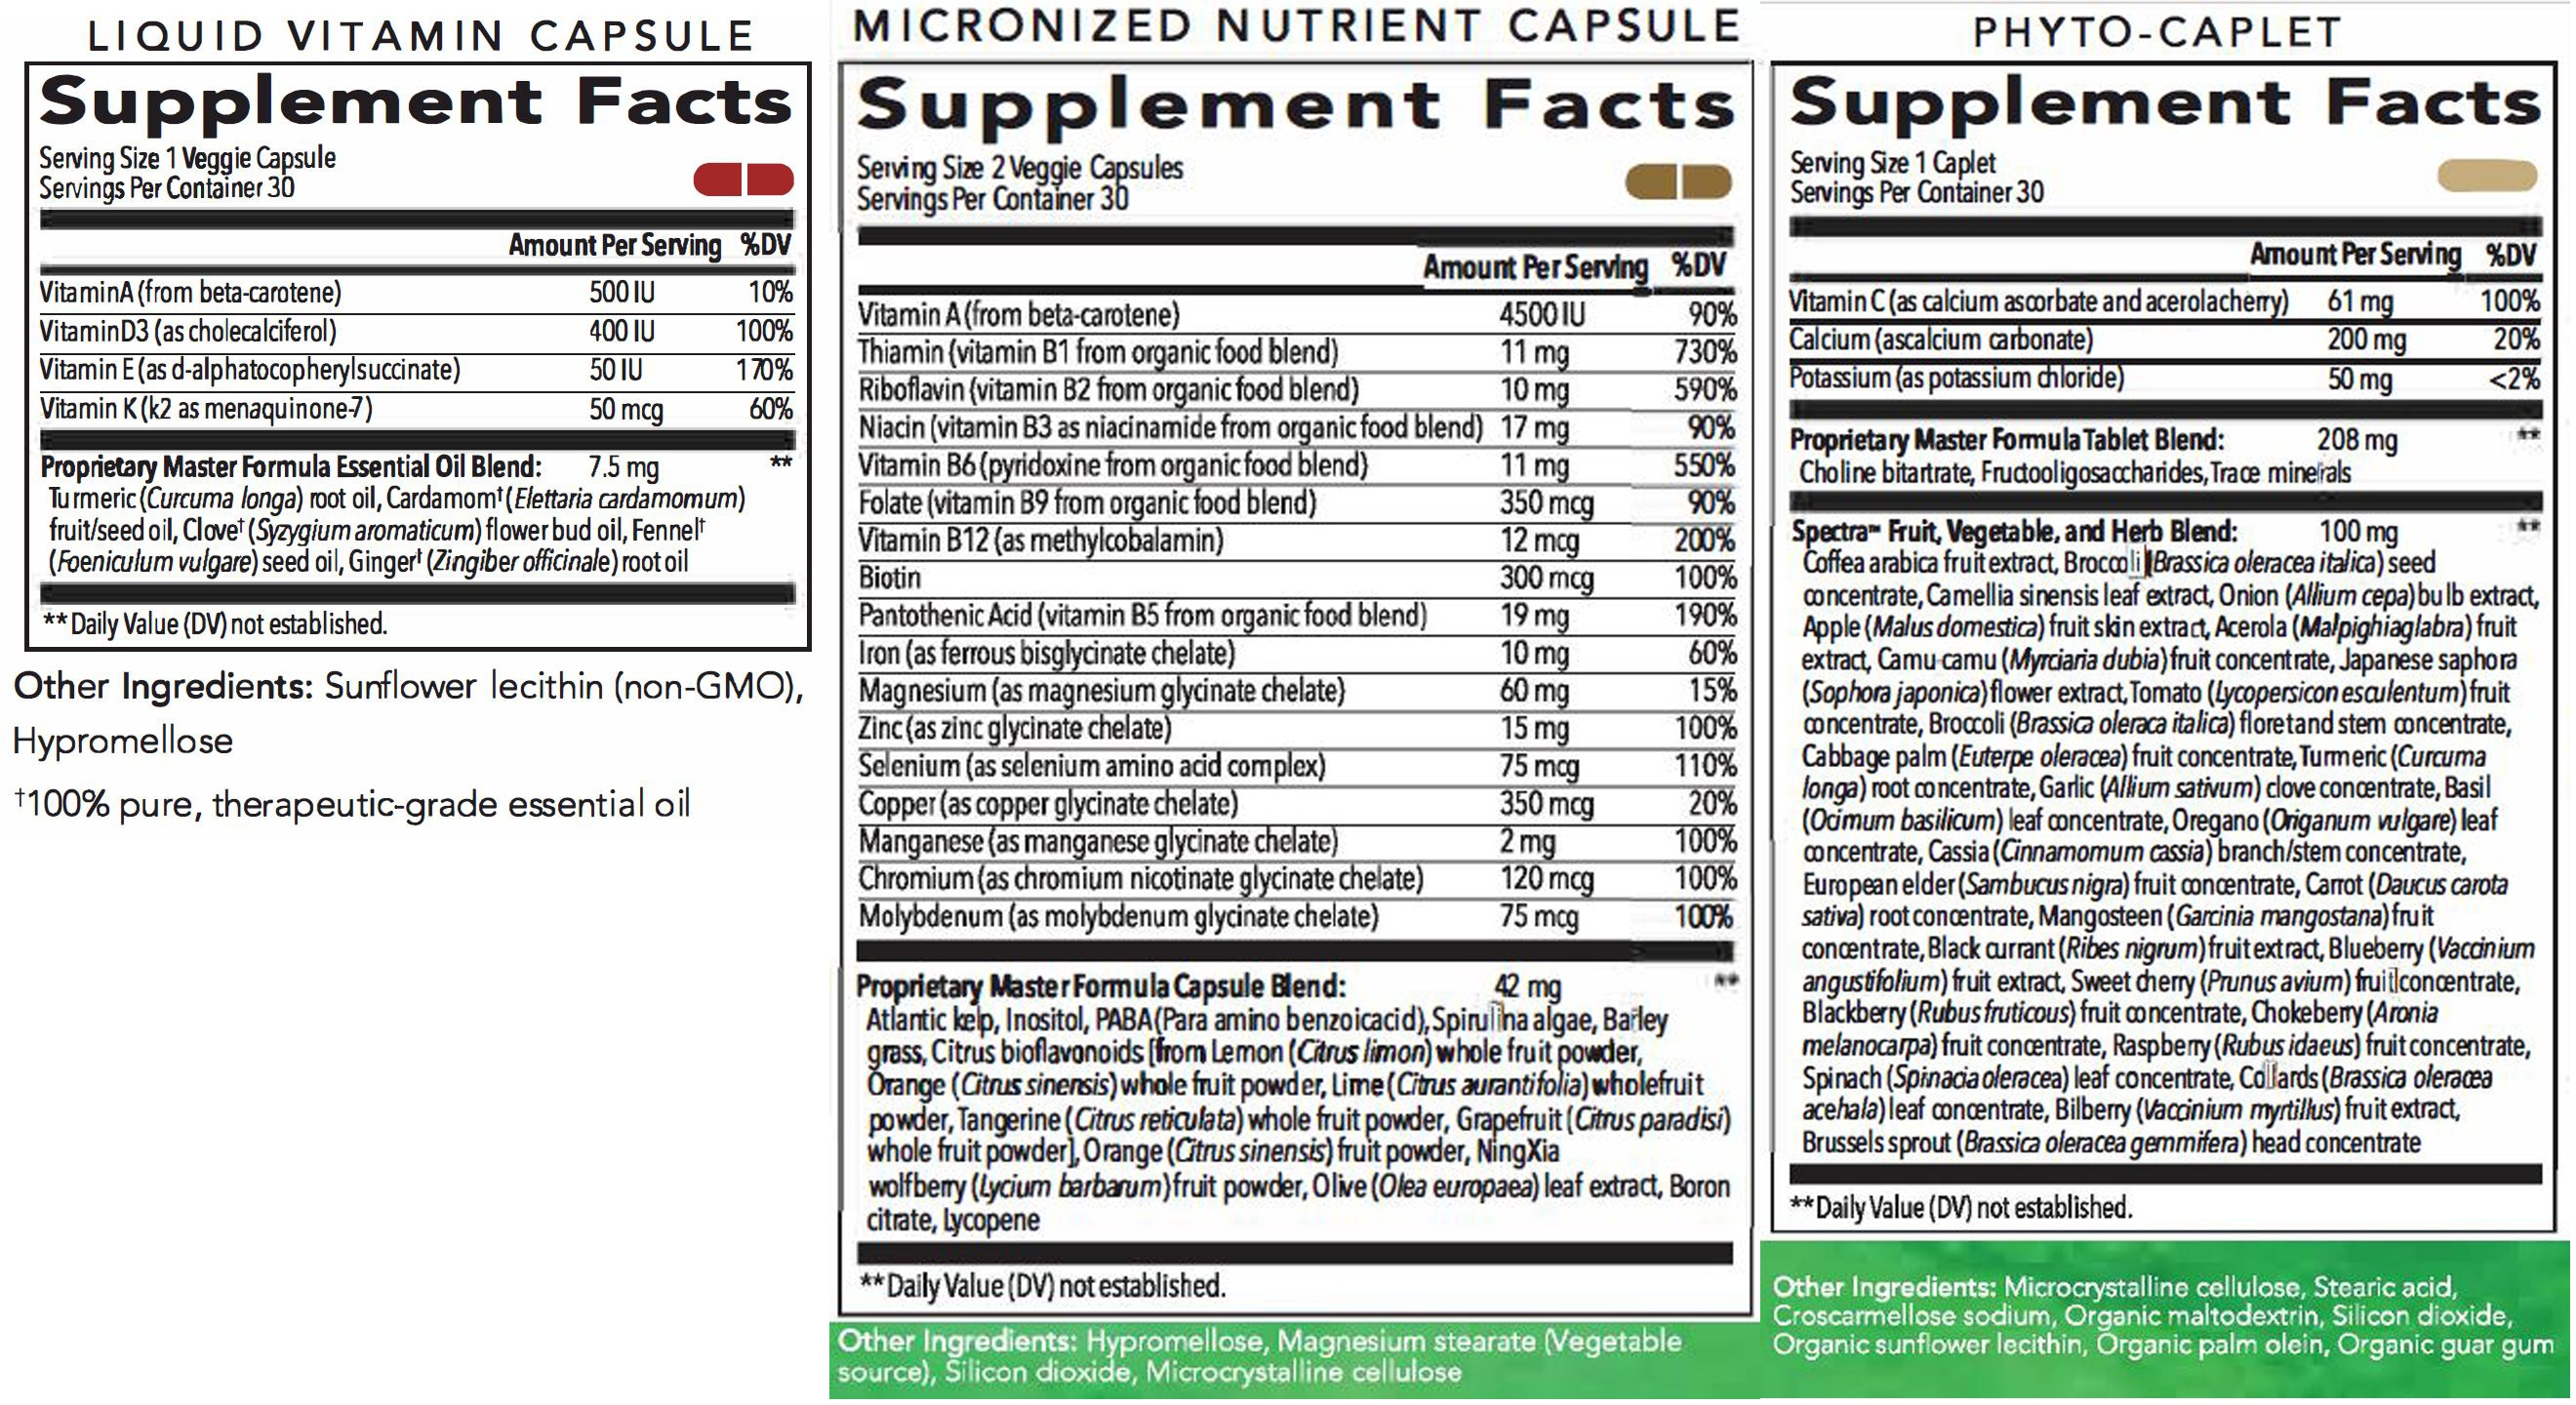 Supplement Information - Master Formula